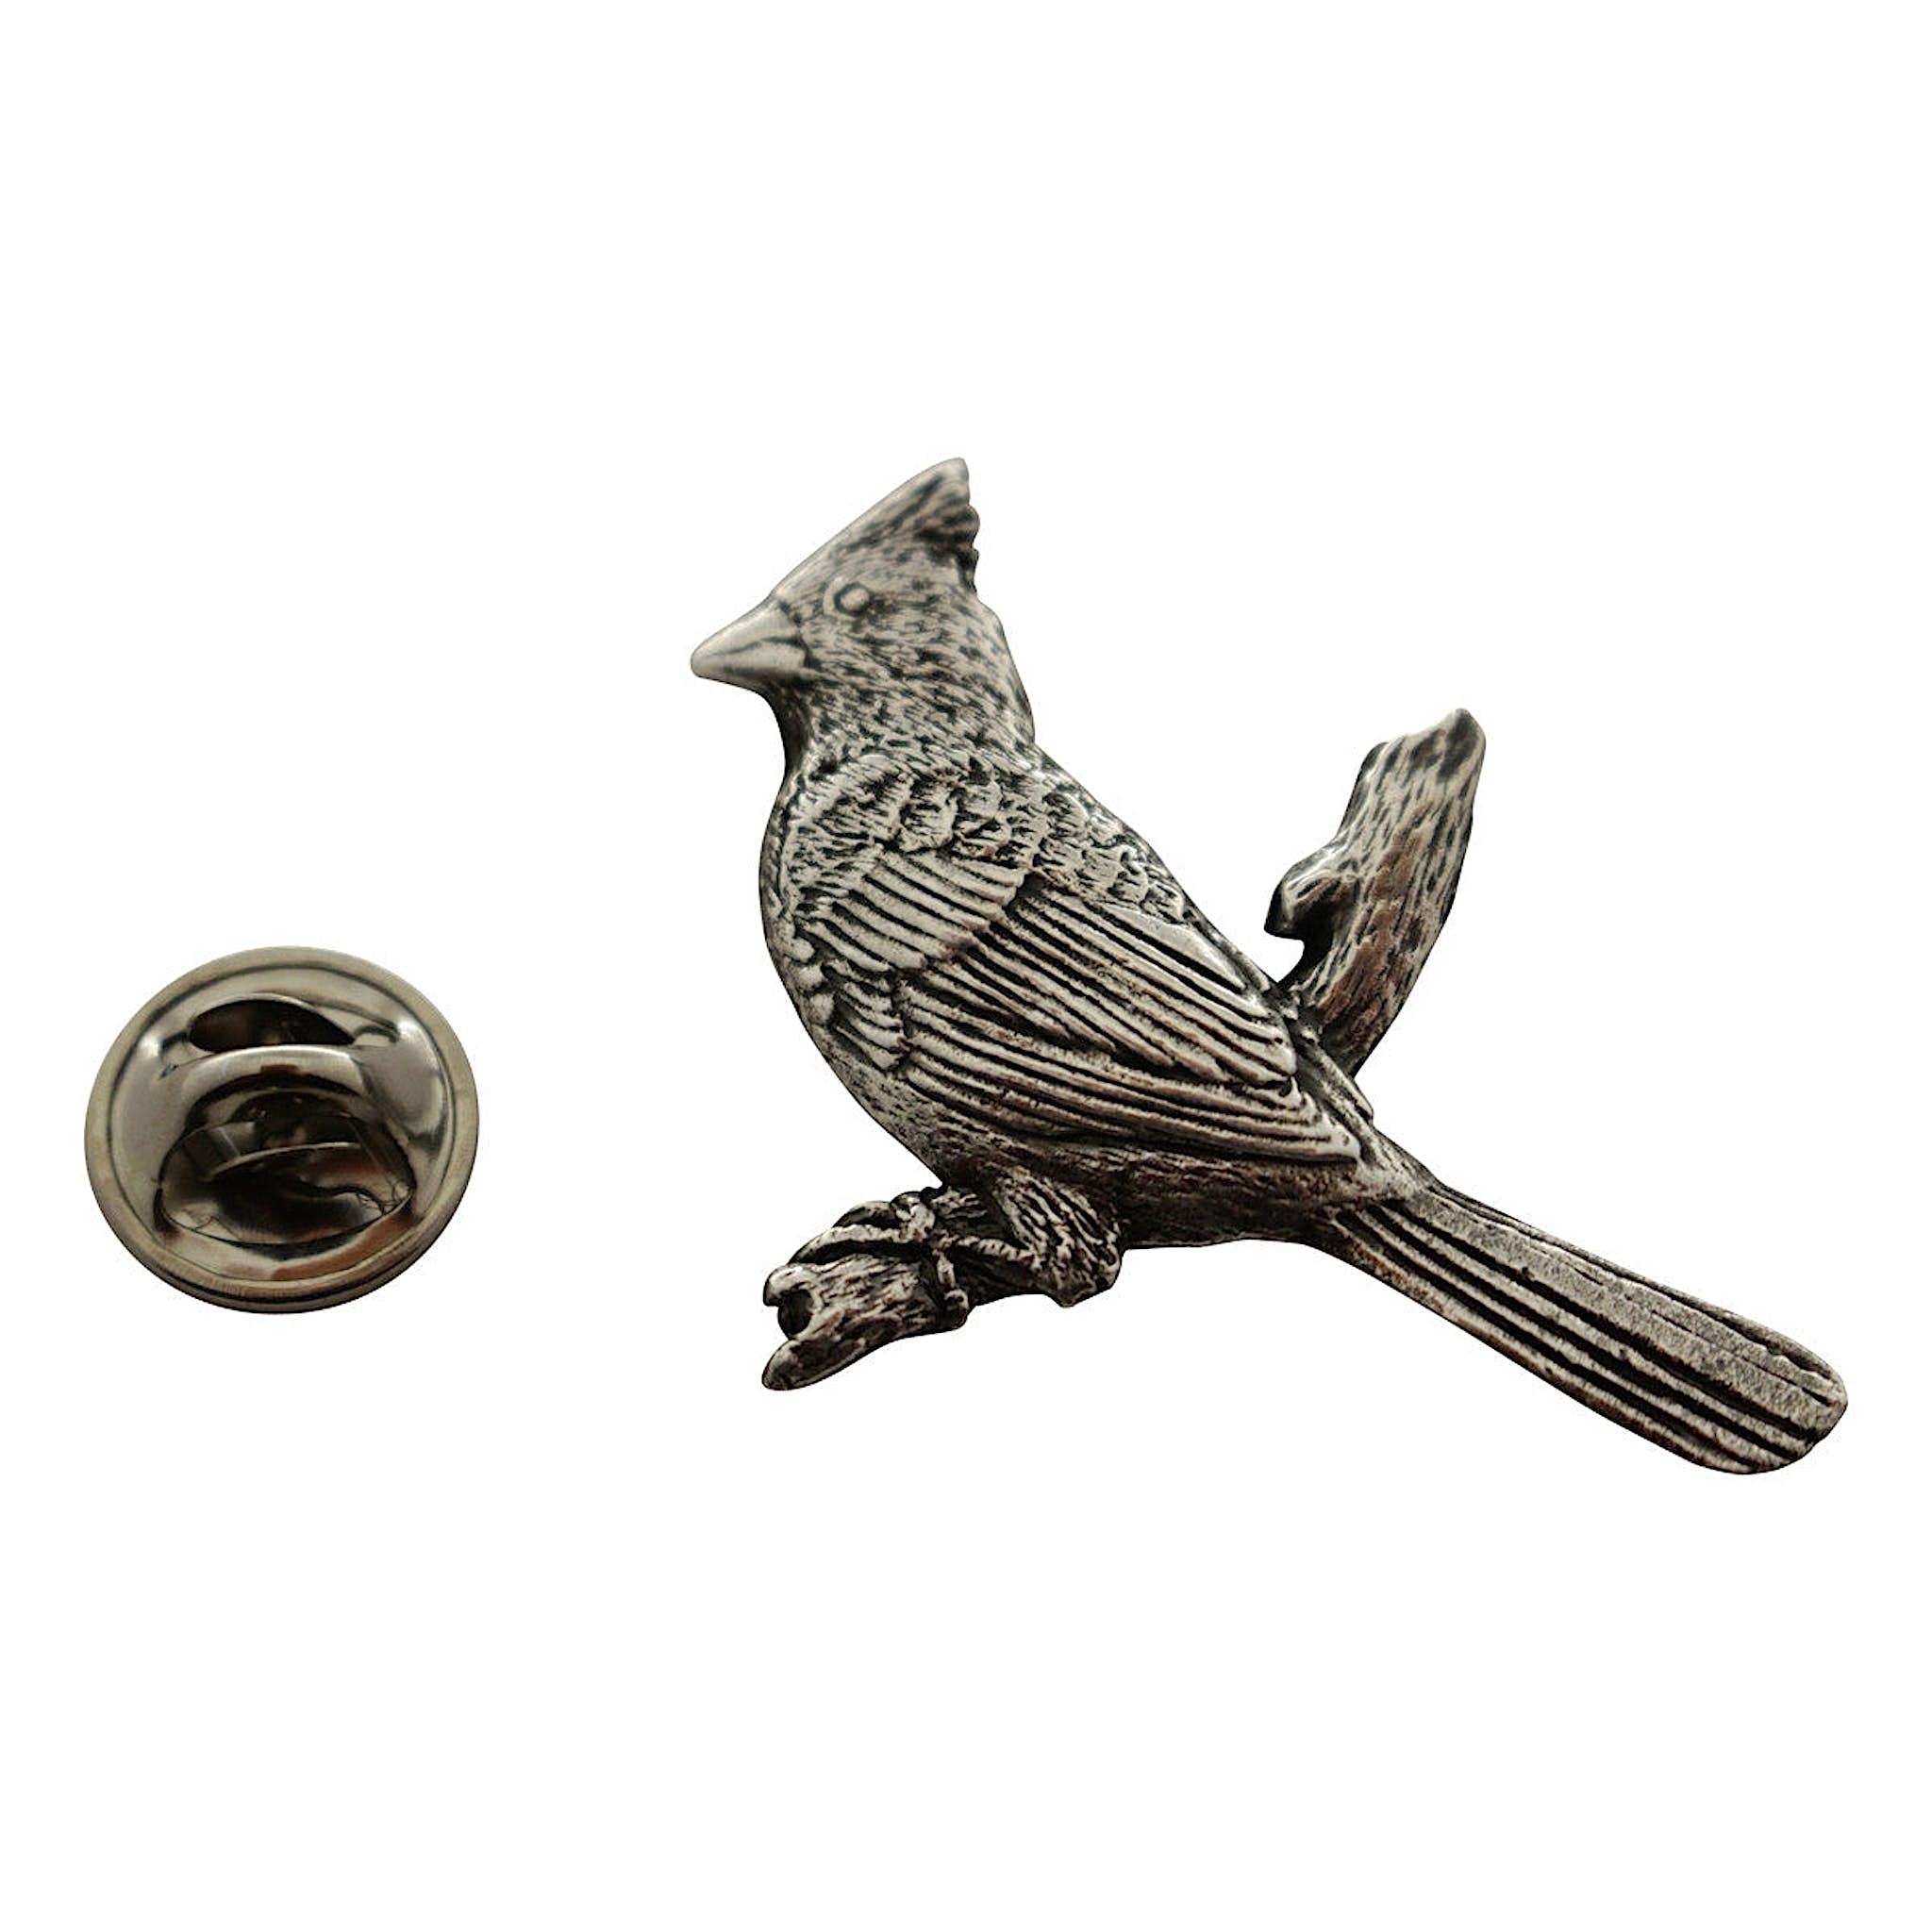 7f23bb3dd84f Cardinal Pin ~ Antiqued Pewter ~ Lapel Pin ~ Antiqued Pewter Lapel Pin ~  Sarah's Treats